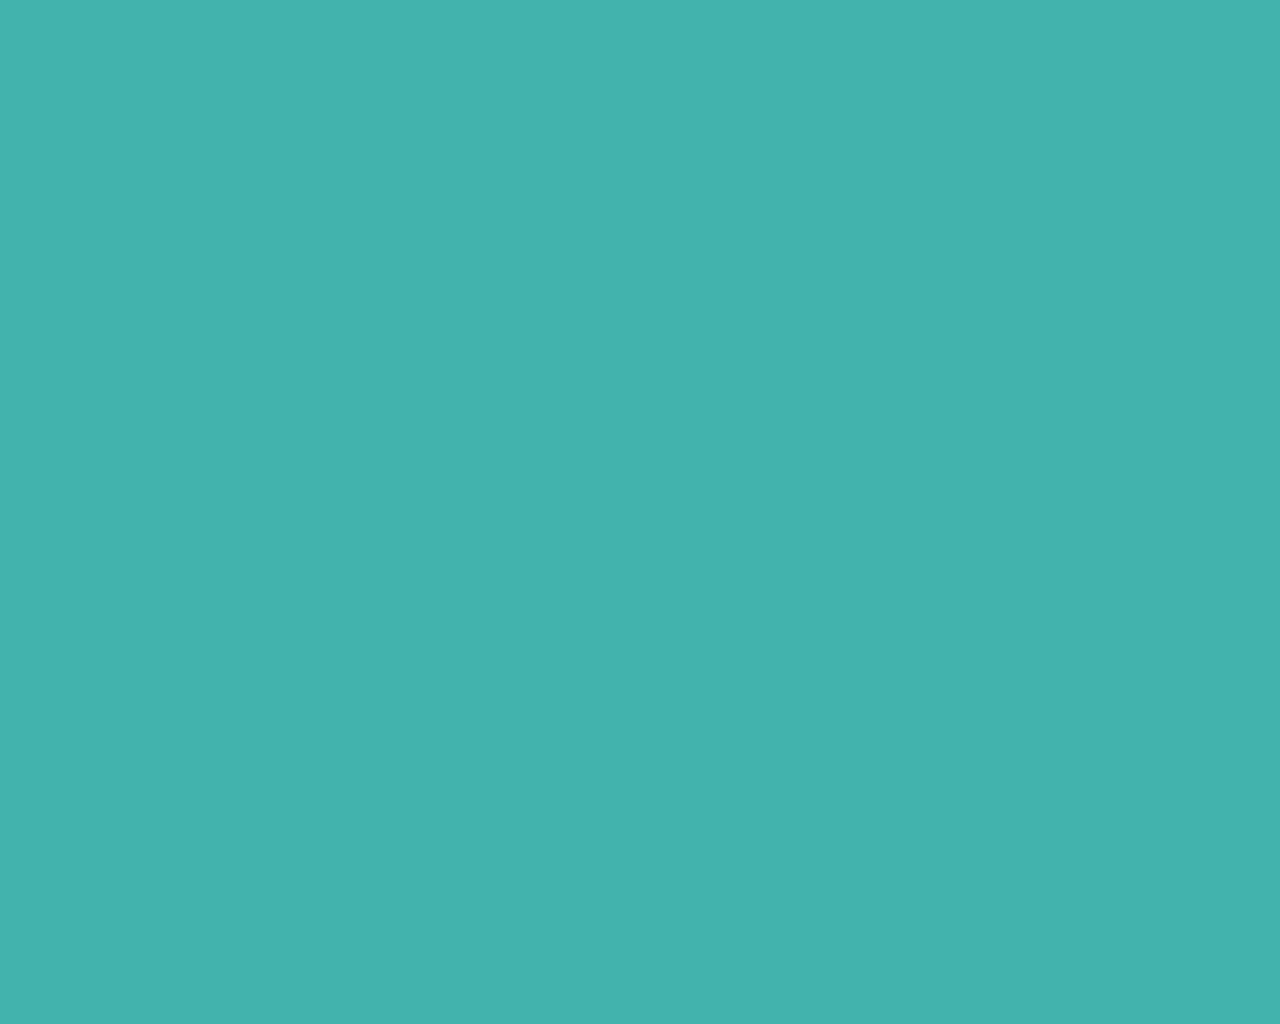 1280x1024 Verdigris Solid Color Background